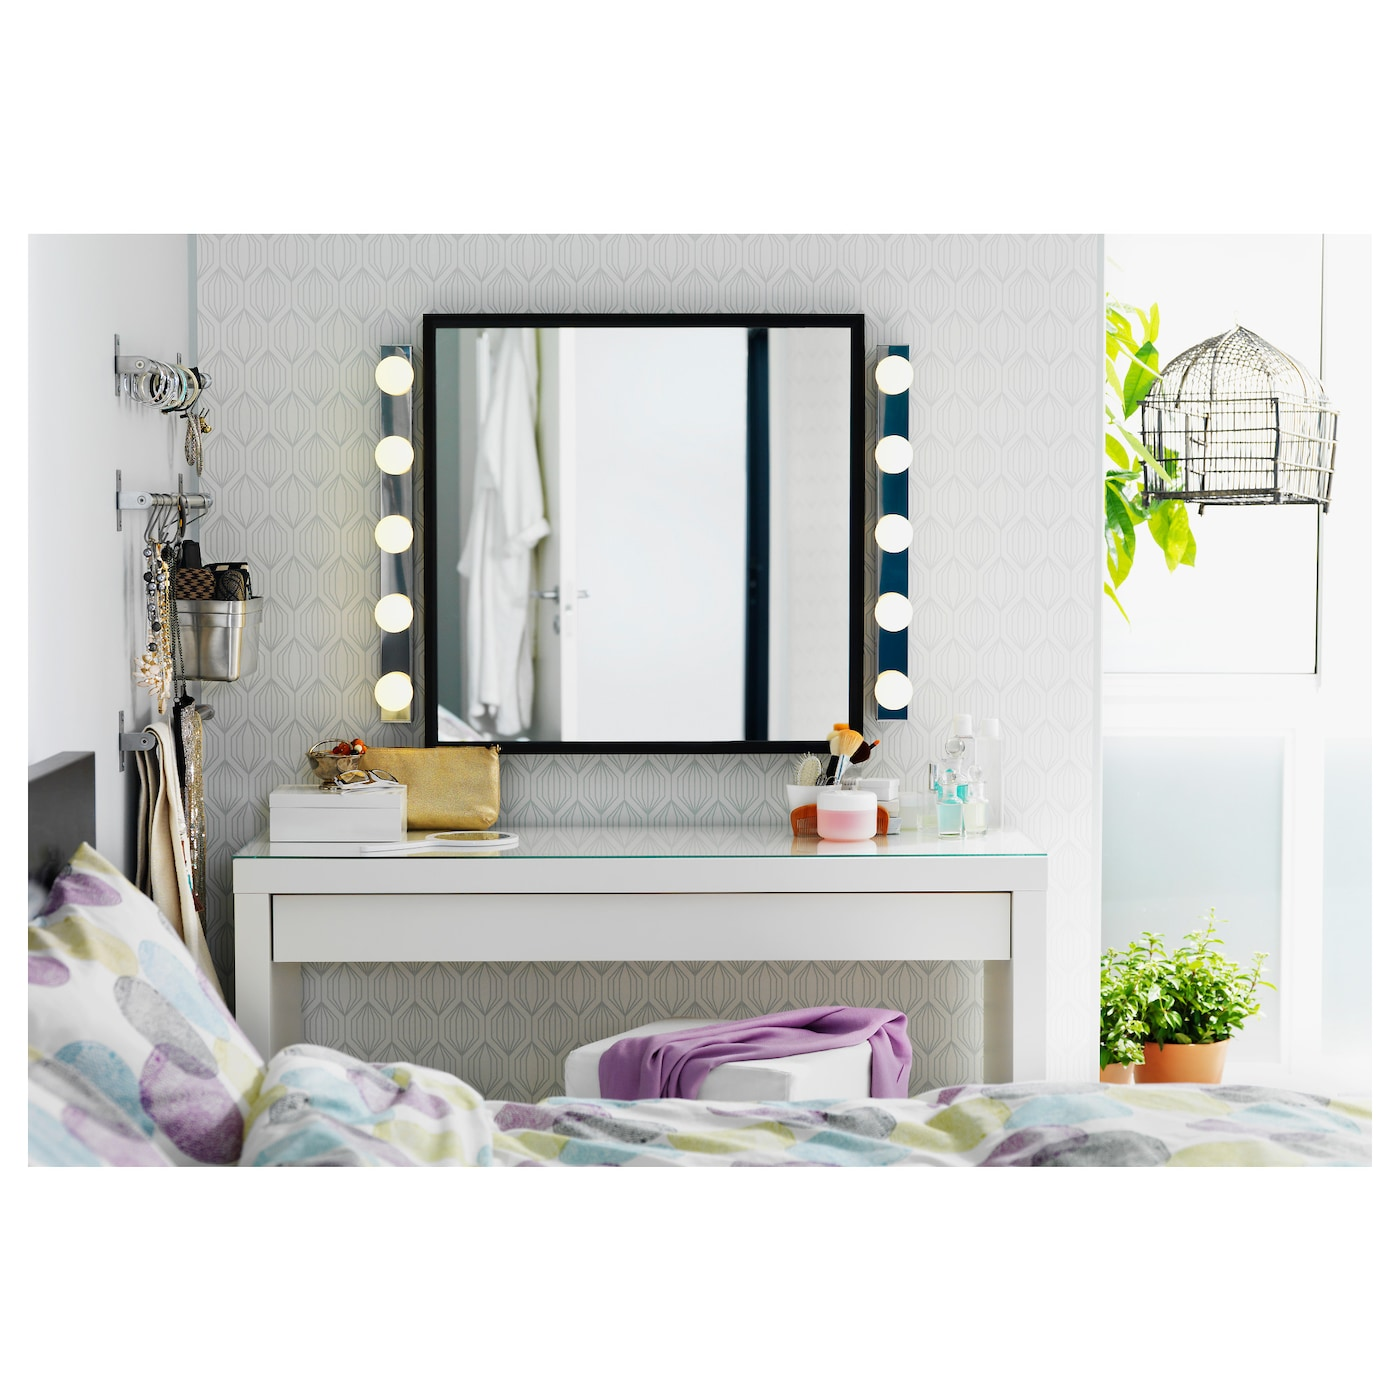 malm coiffeuse blanc 120 x 41 cm ikea. Black Bedroom Furniture Sets. Home Design Ideas